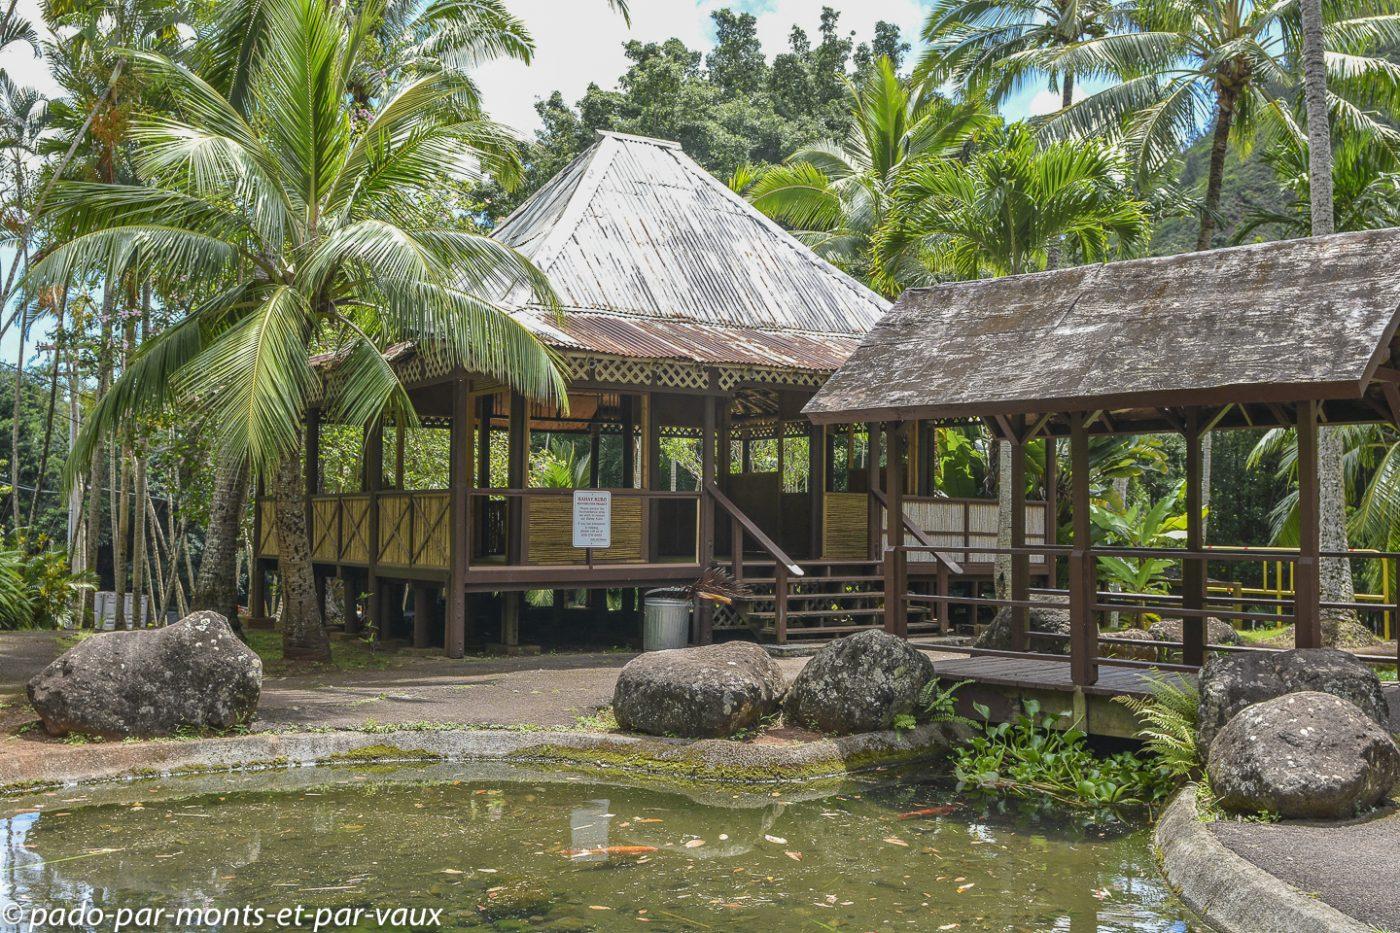 Kepaniwai gardens